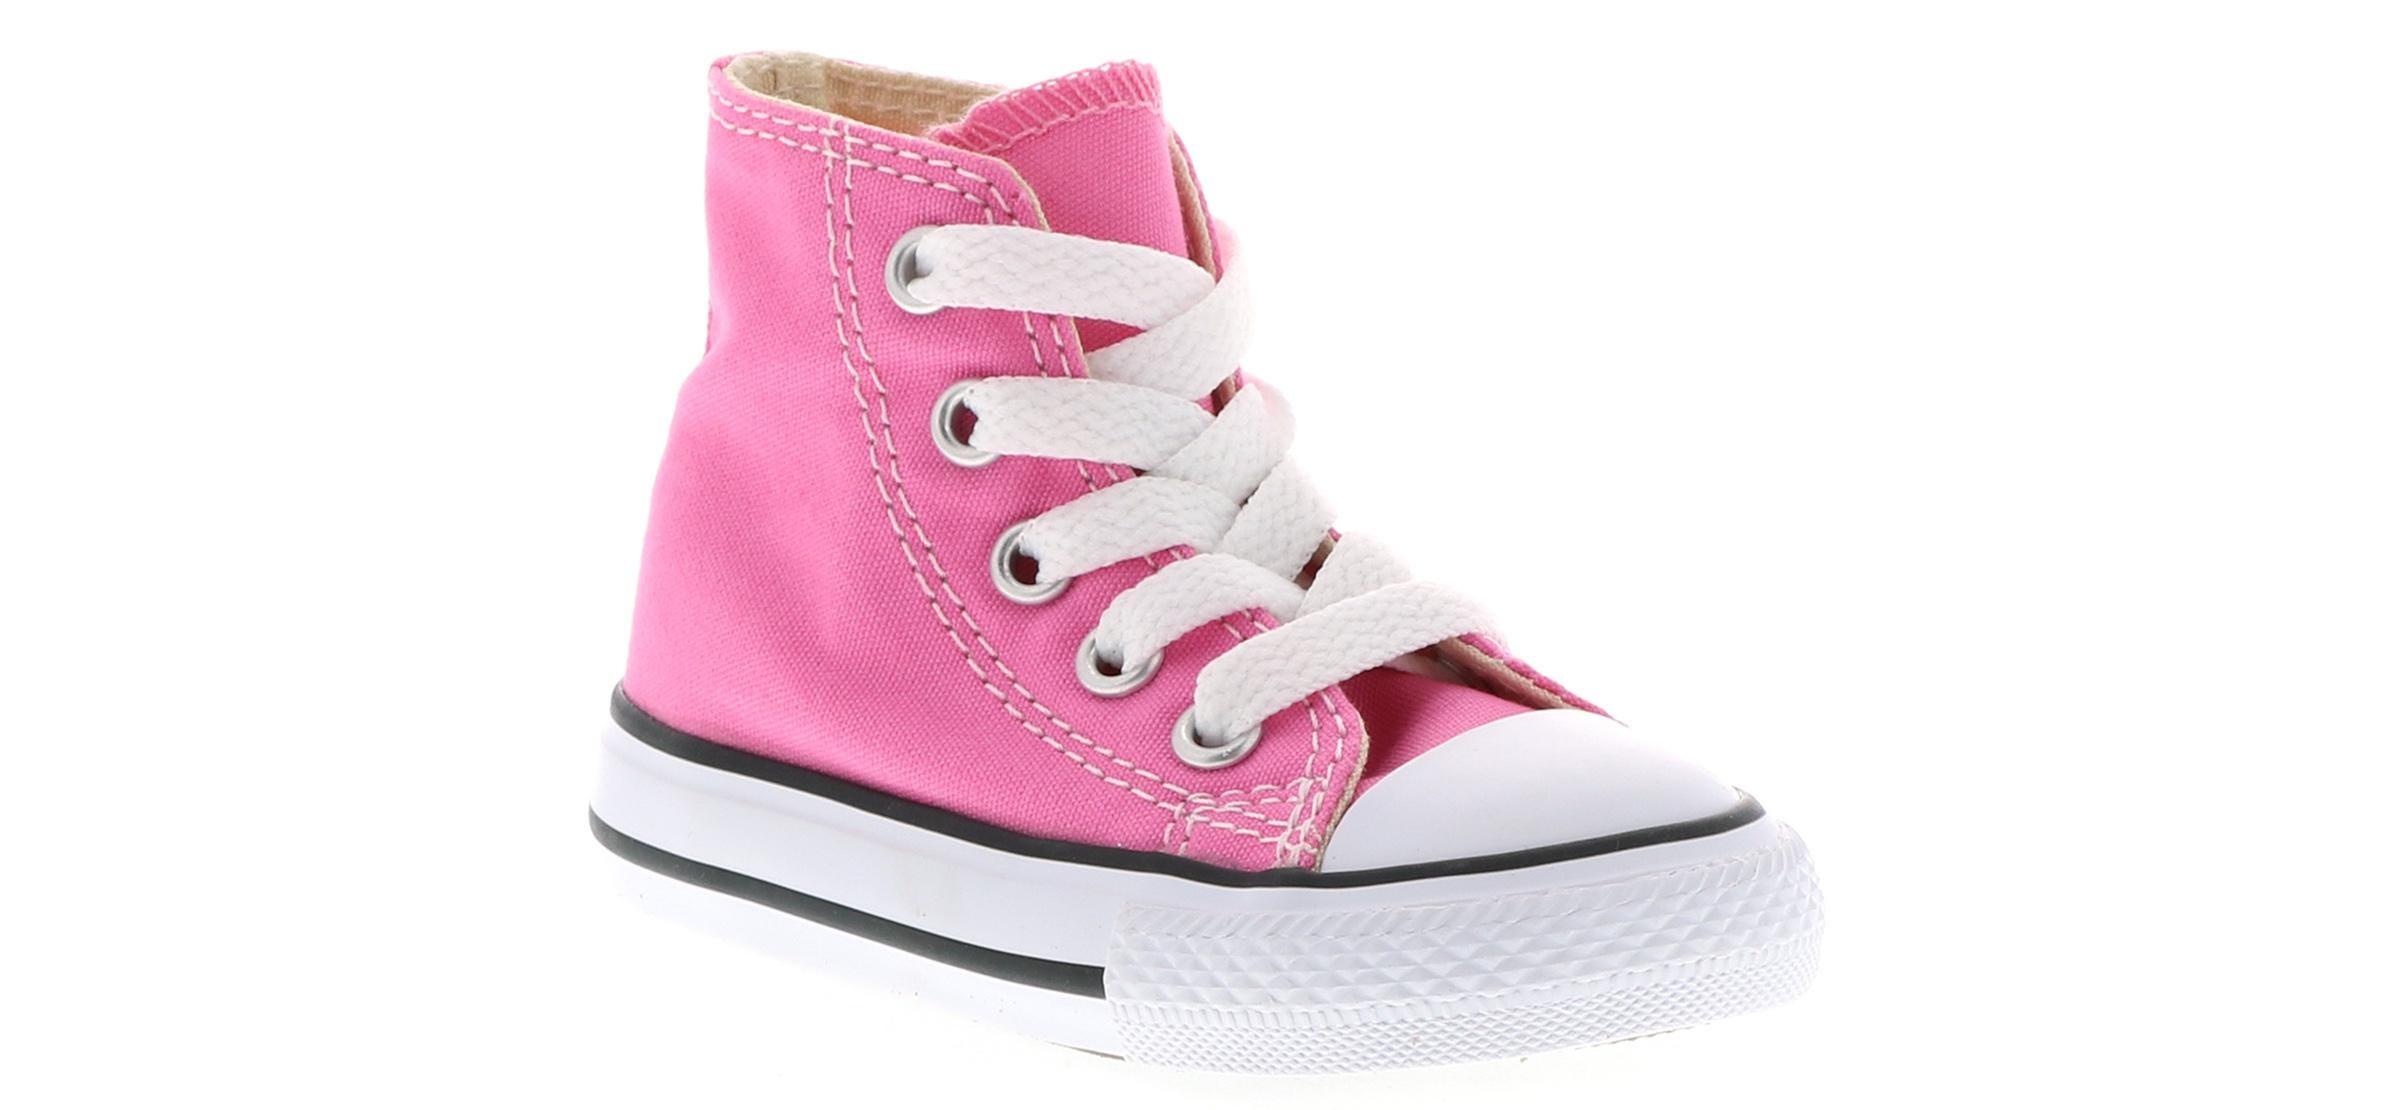 converse all star hi canvas sneaker